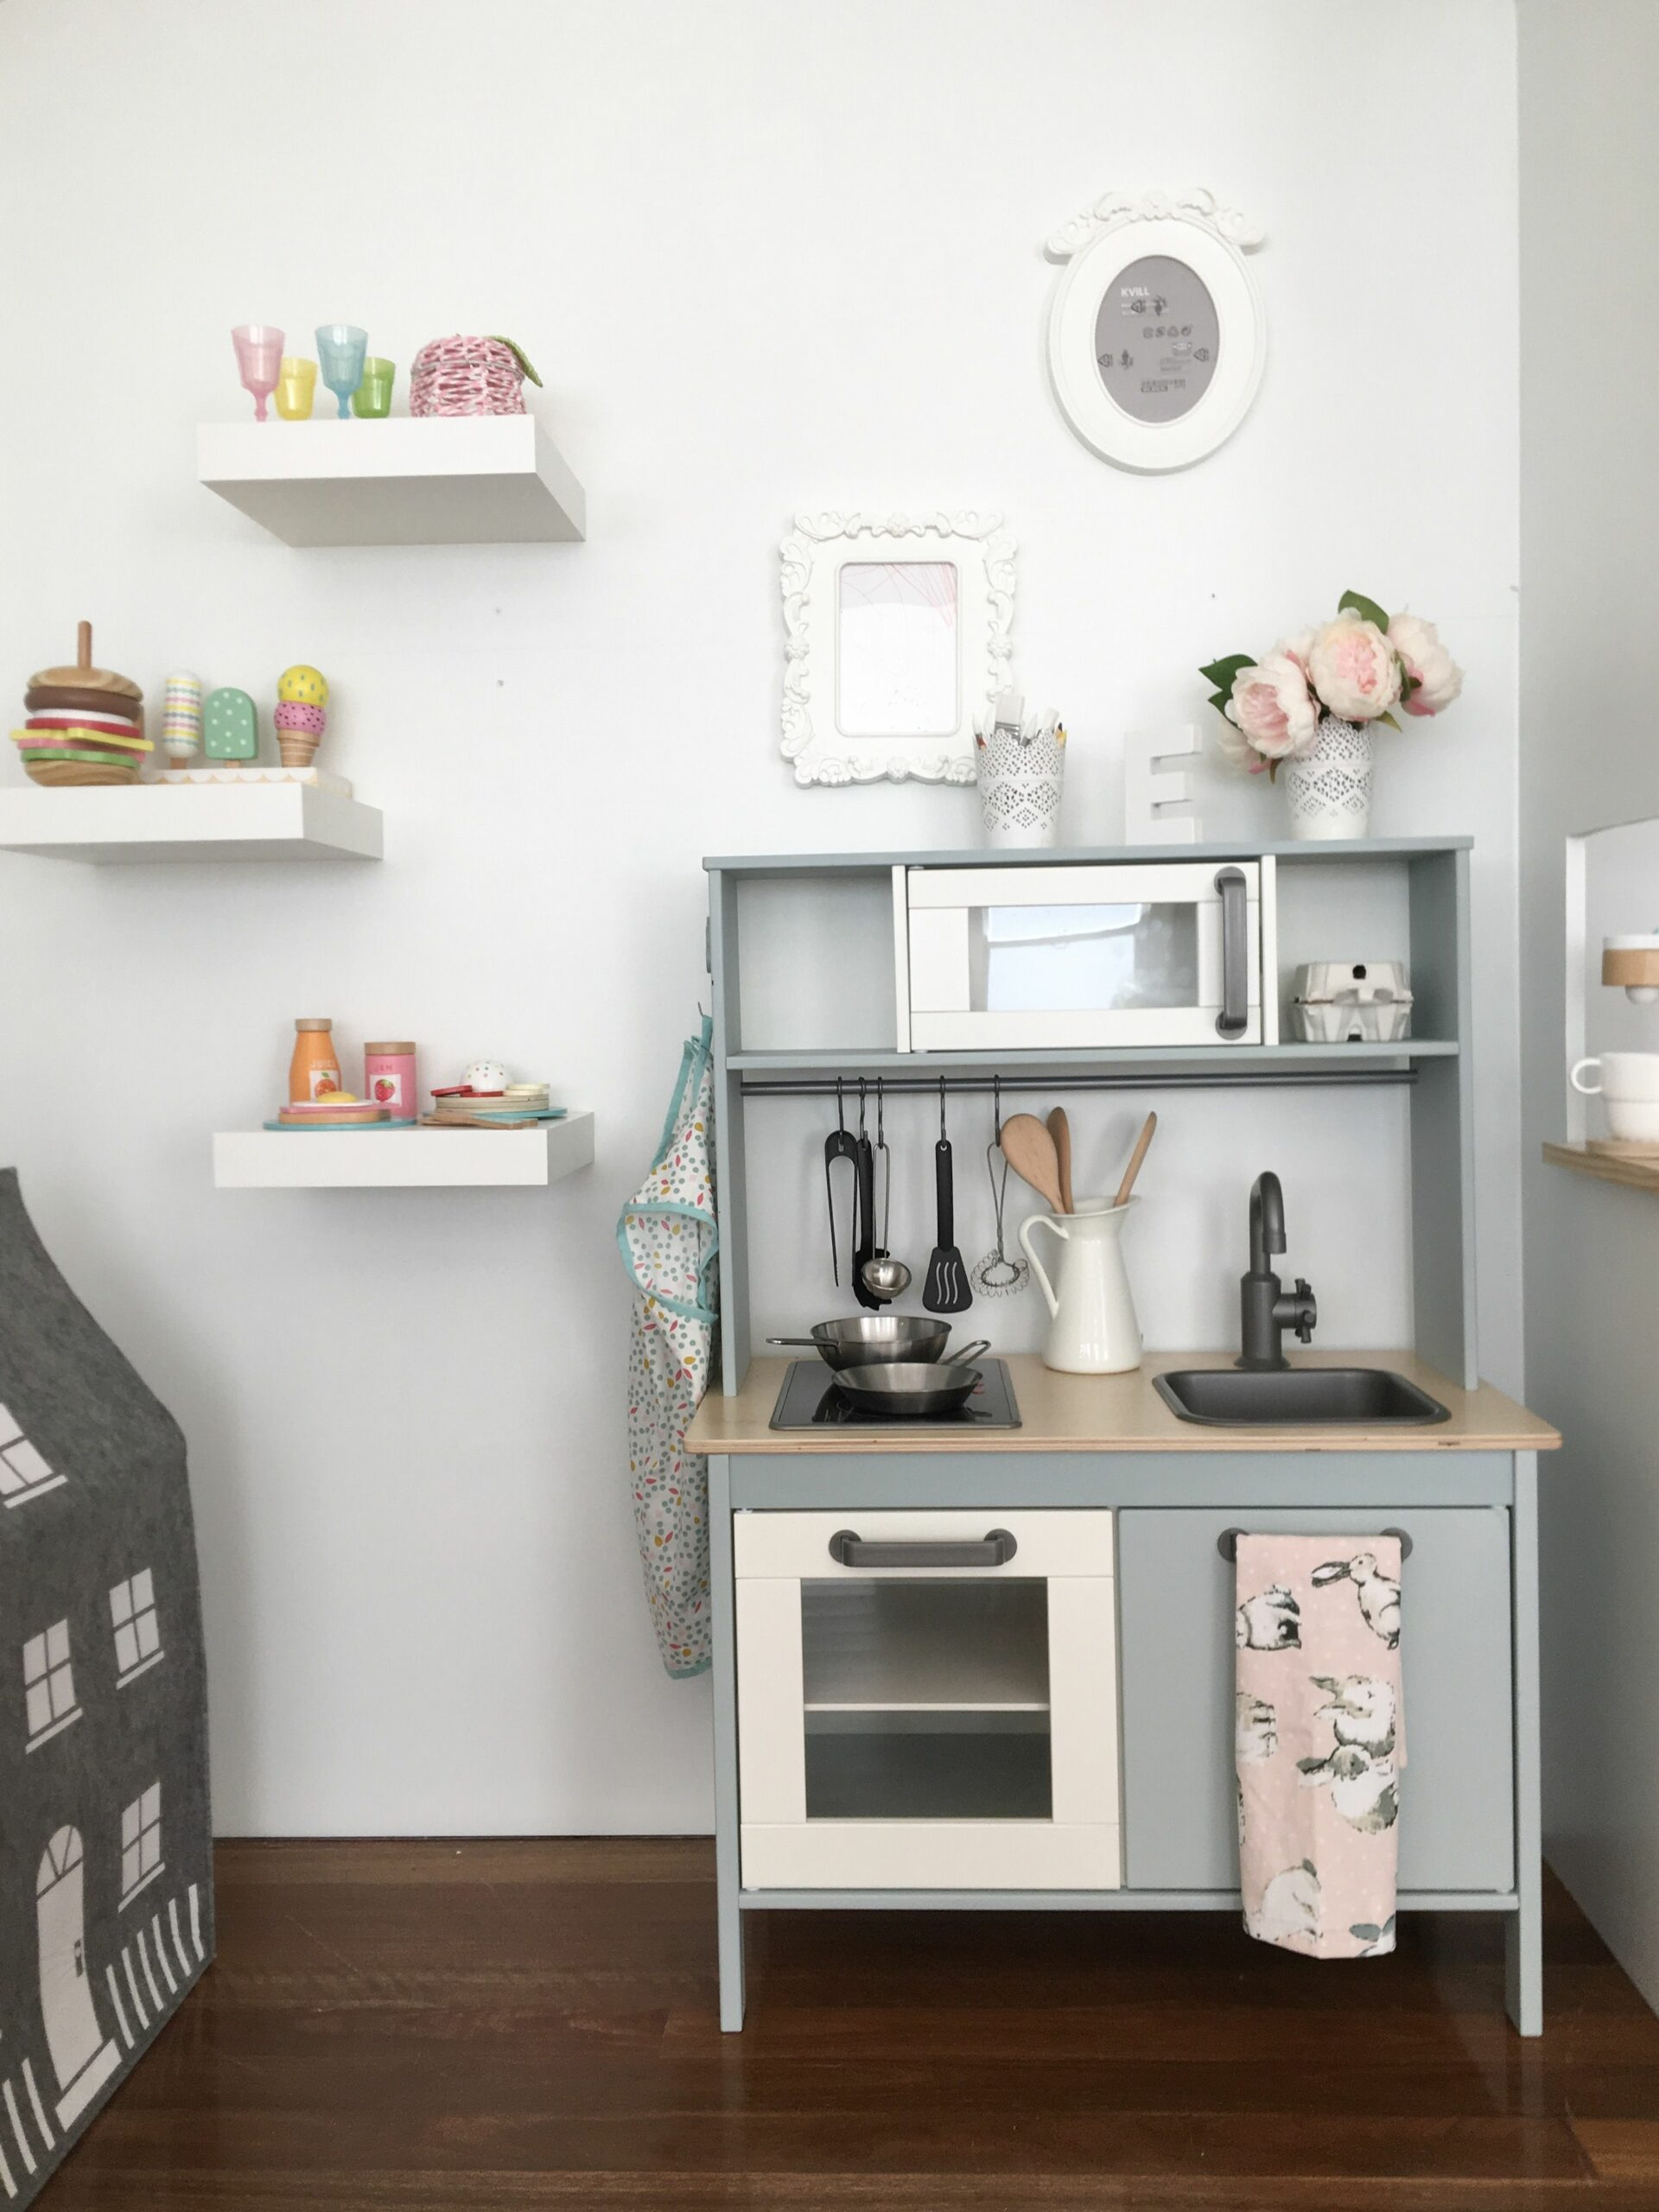 Childrens Ikea Kitchen Makeover